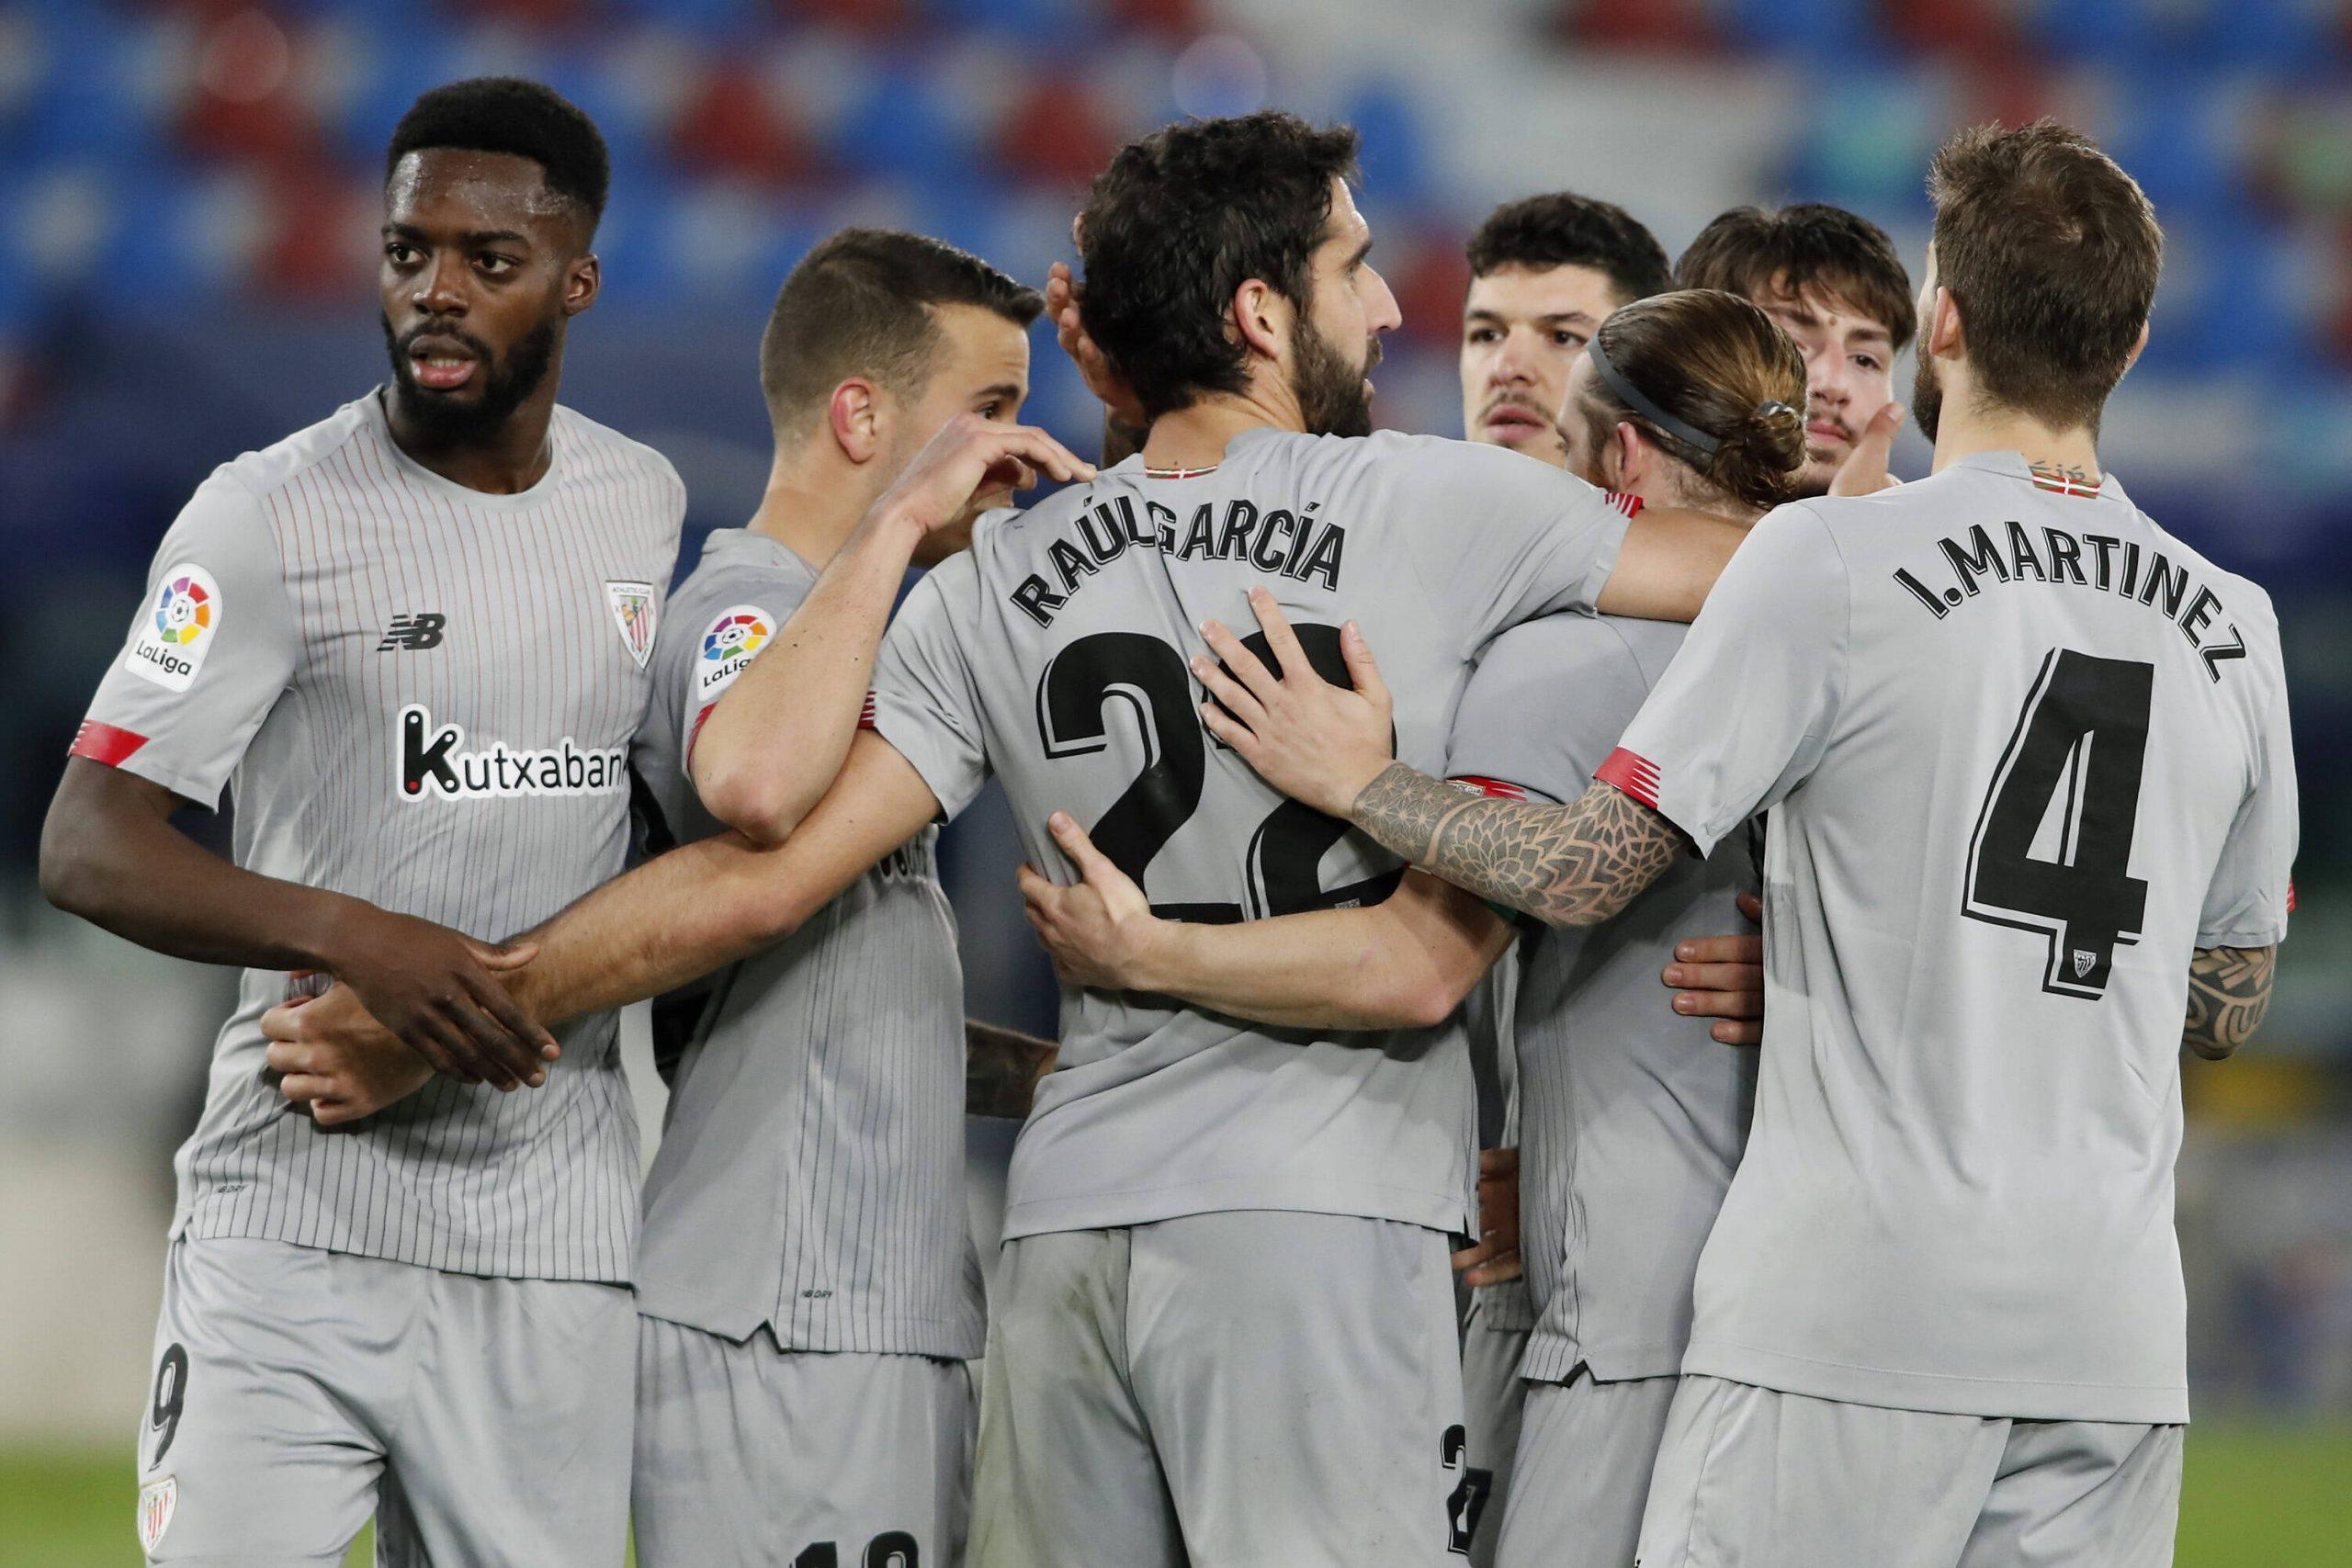 Athletic de Bilbao, Barcelona's rival in the Copa del Rey final